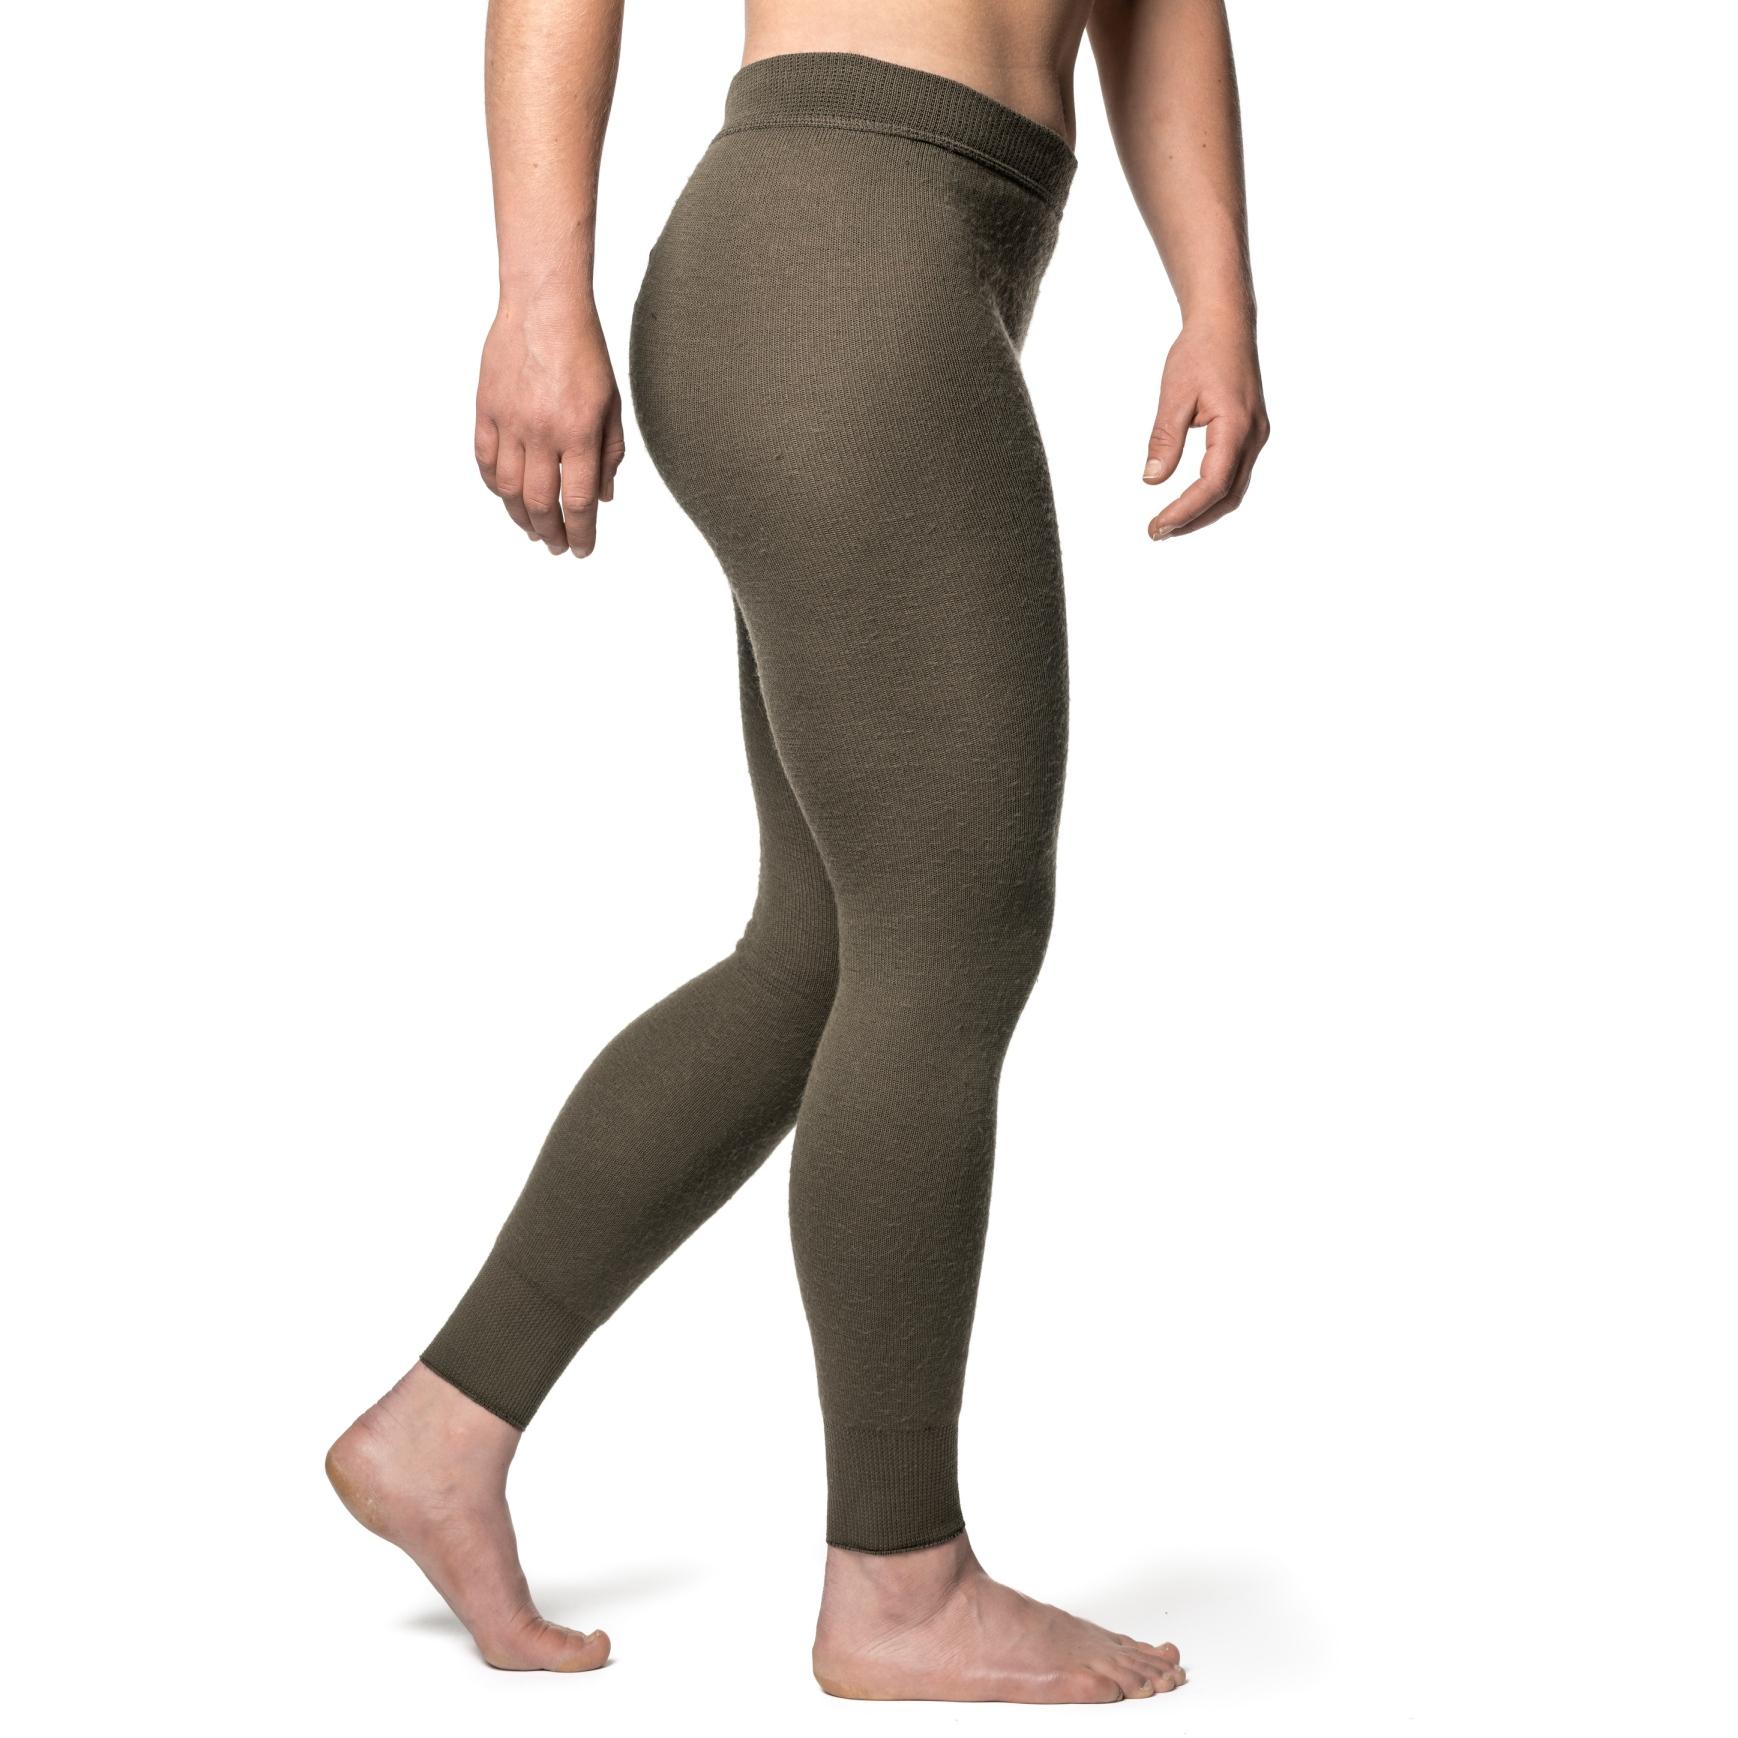 Image of Woolpower Long Johns 200 Unisex Underpants - pine green